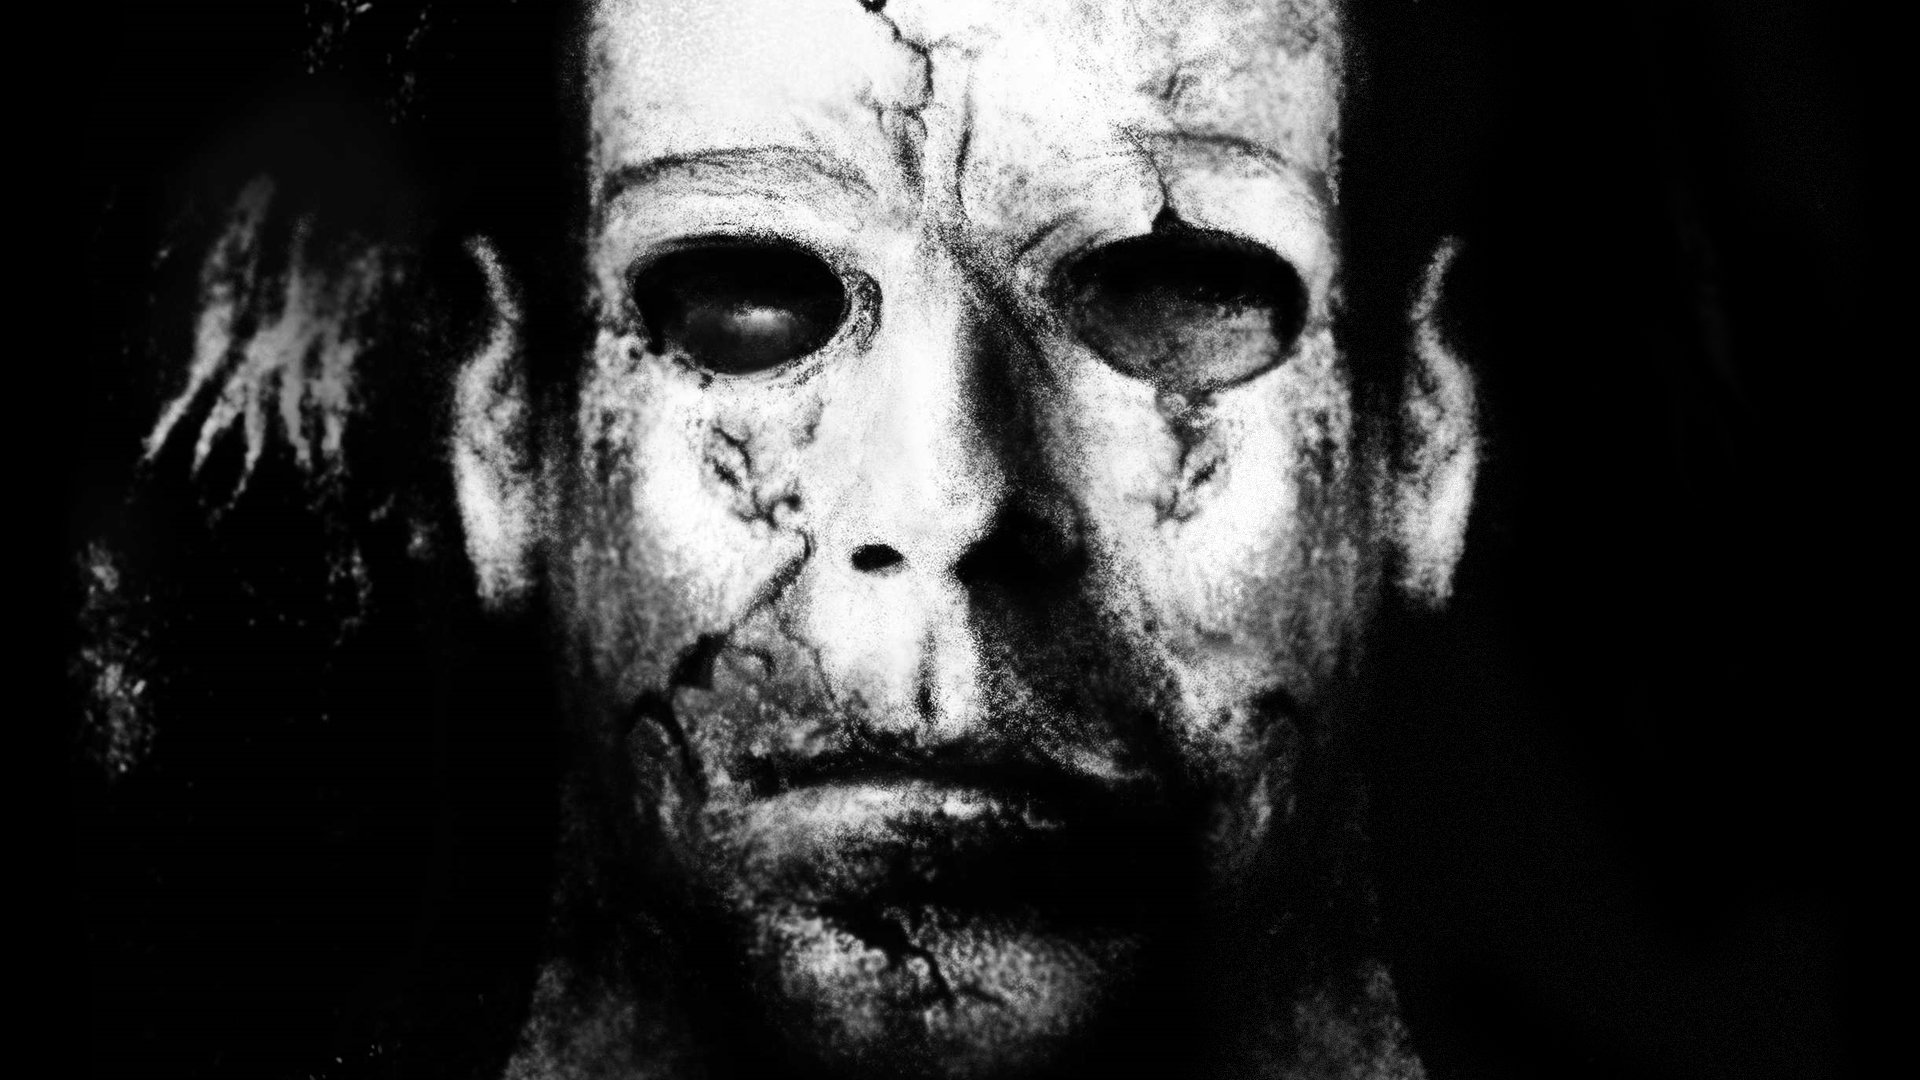 Halloween II 2009 HD Wallpaper Background Image 1920x1080 1920x1080